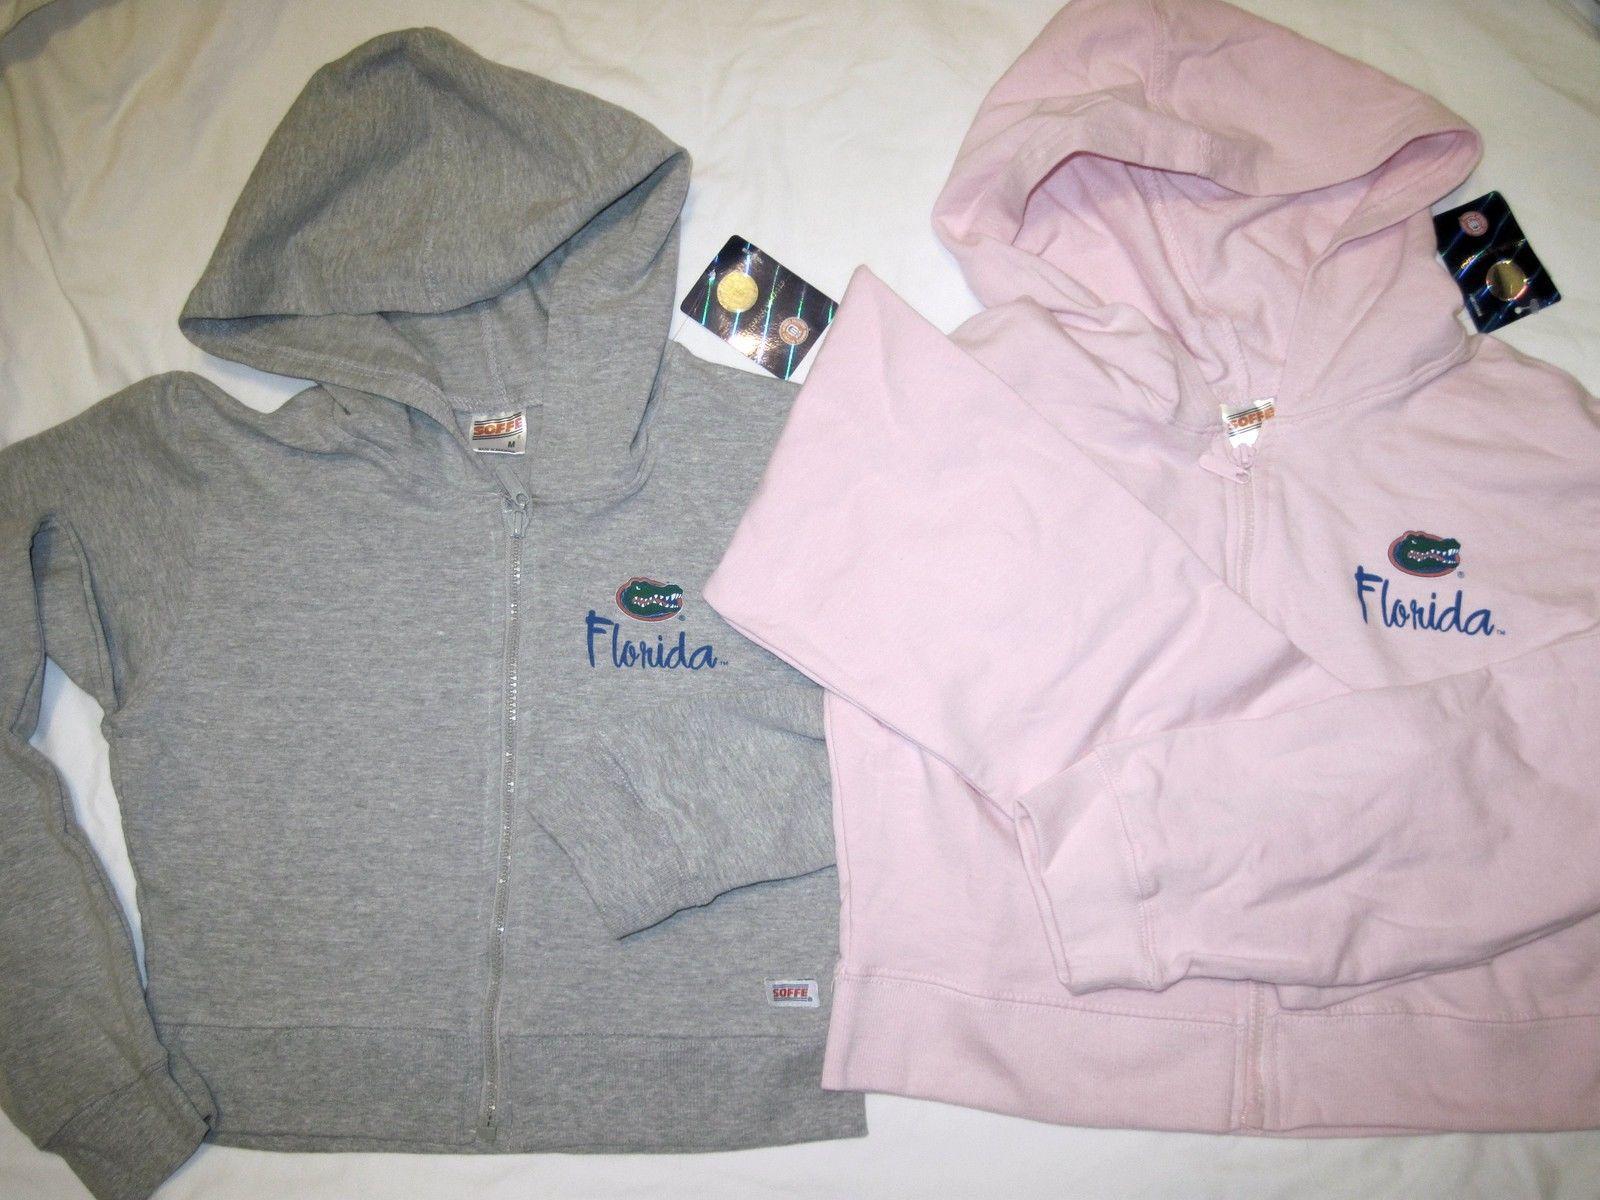 NWT University of Florida UF Gators Hoodie Zipper Jacket Pink Lt Gray by Soffe